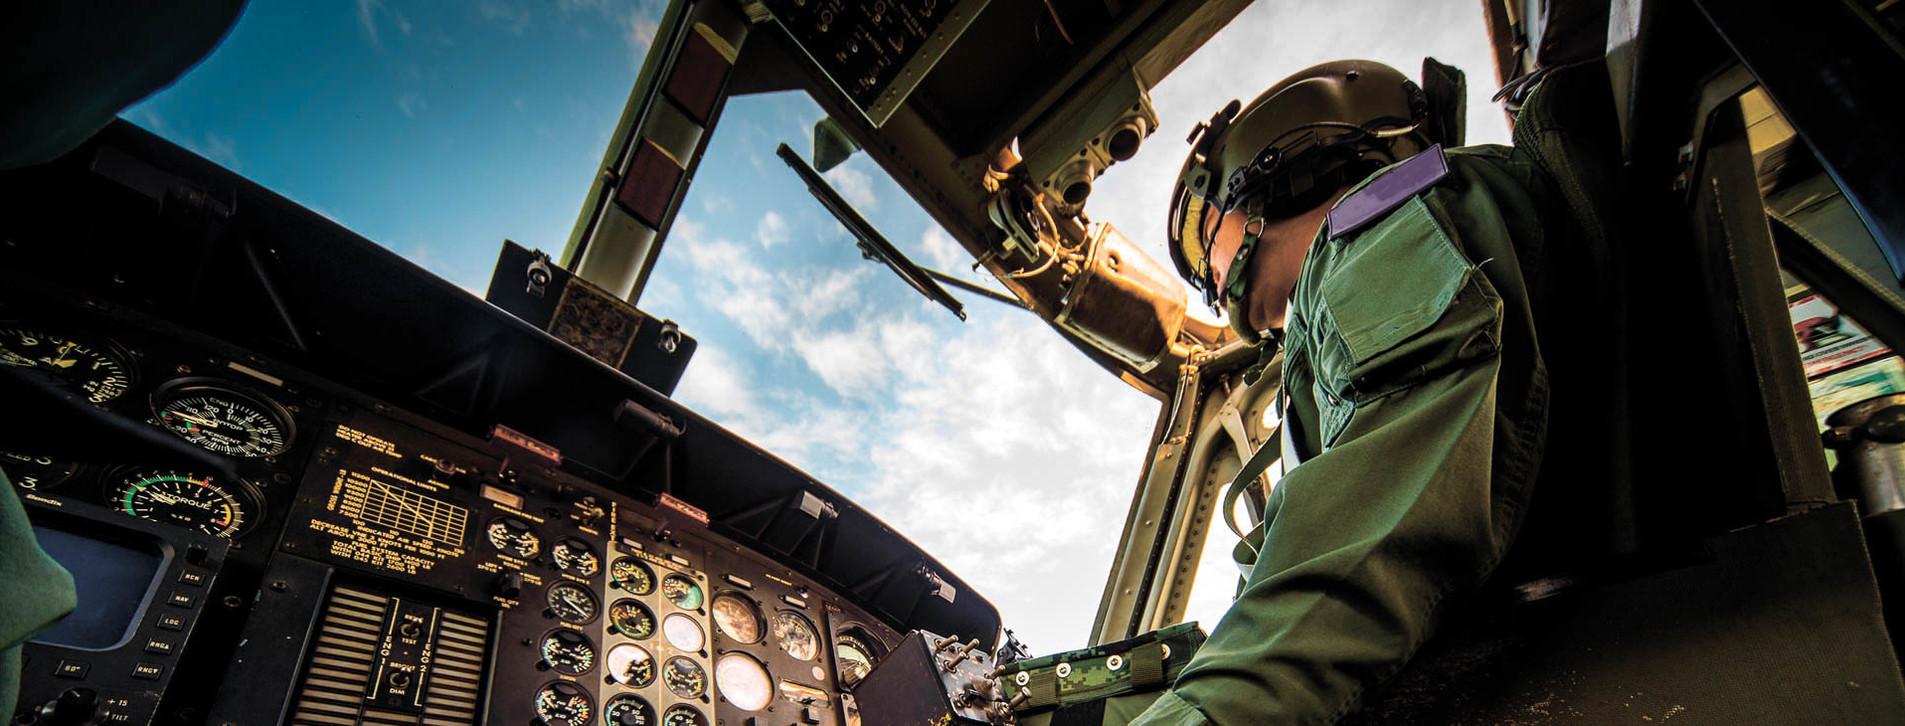 Фото - Авиасимулятор вертолета Ми-8